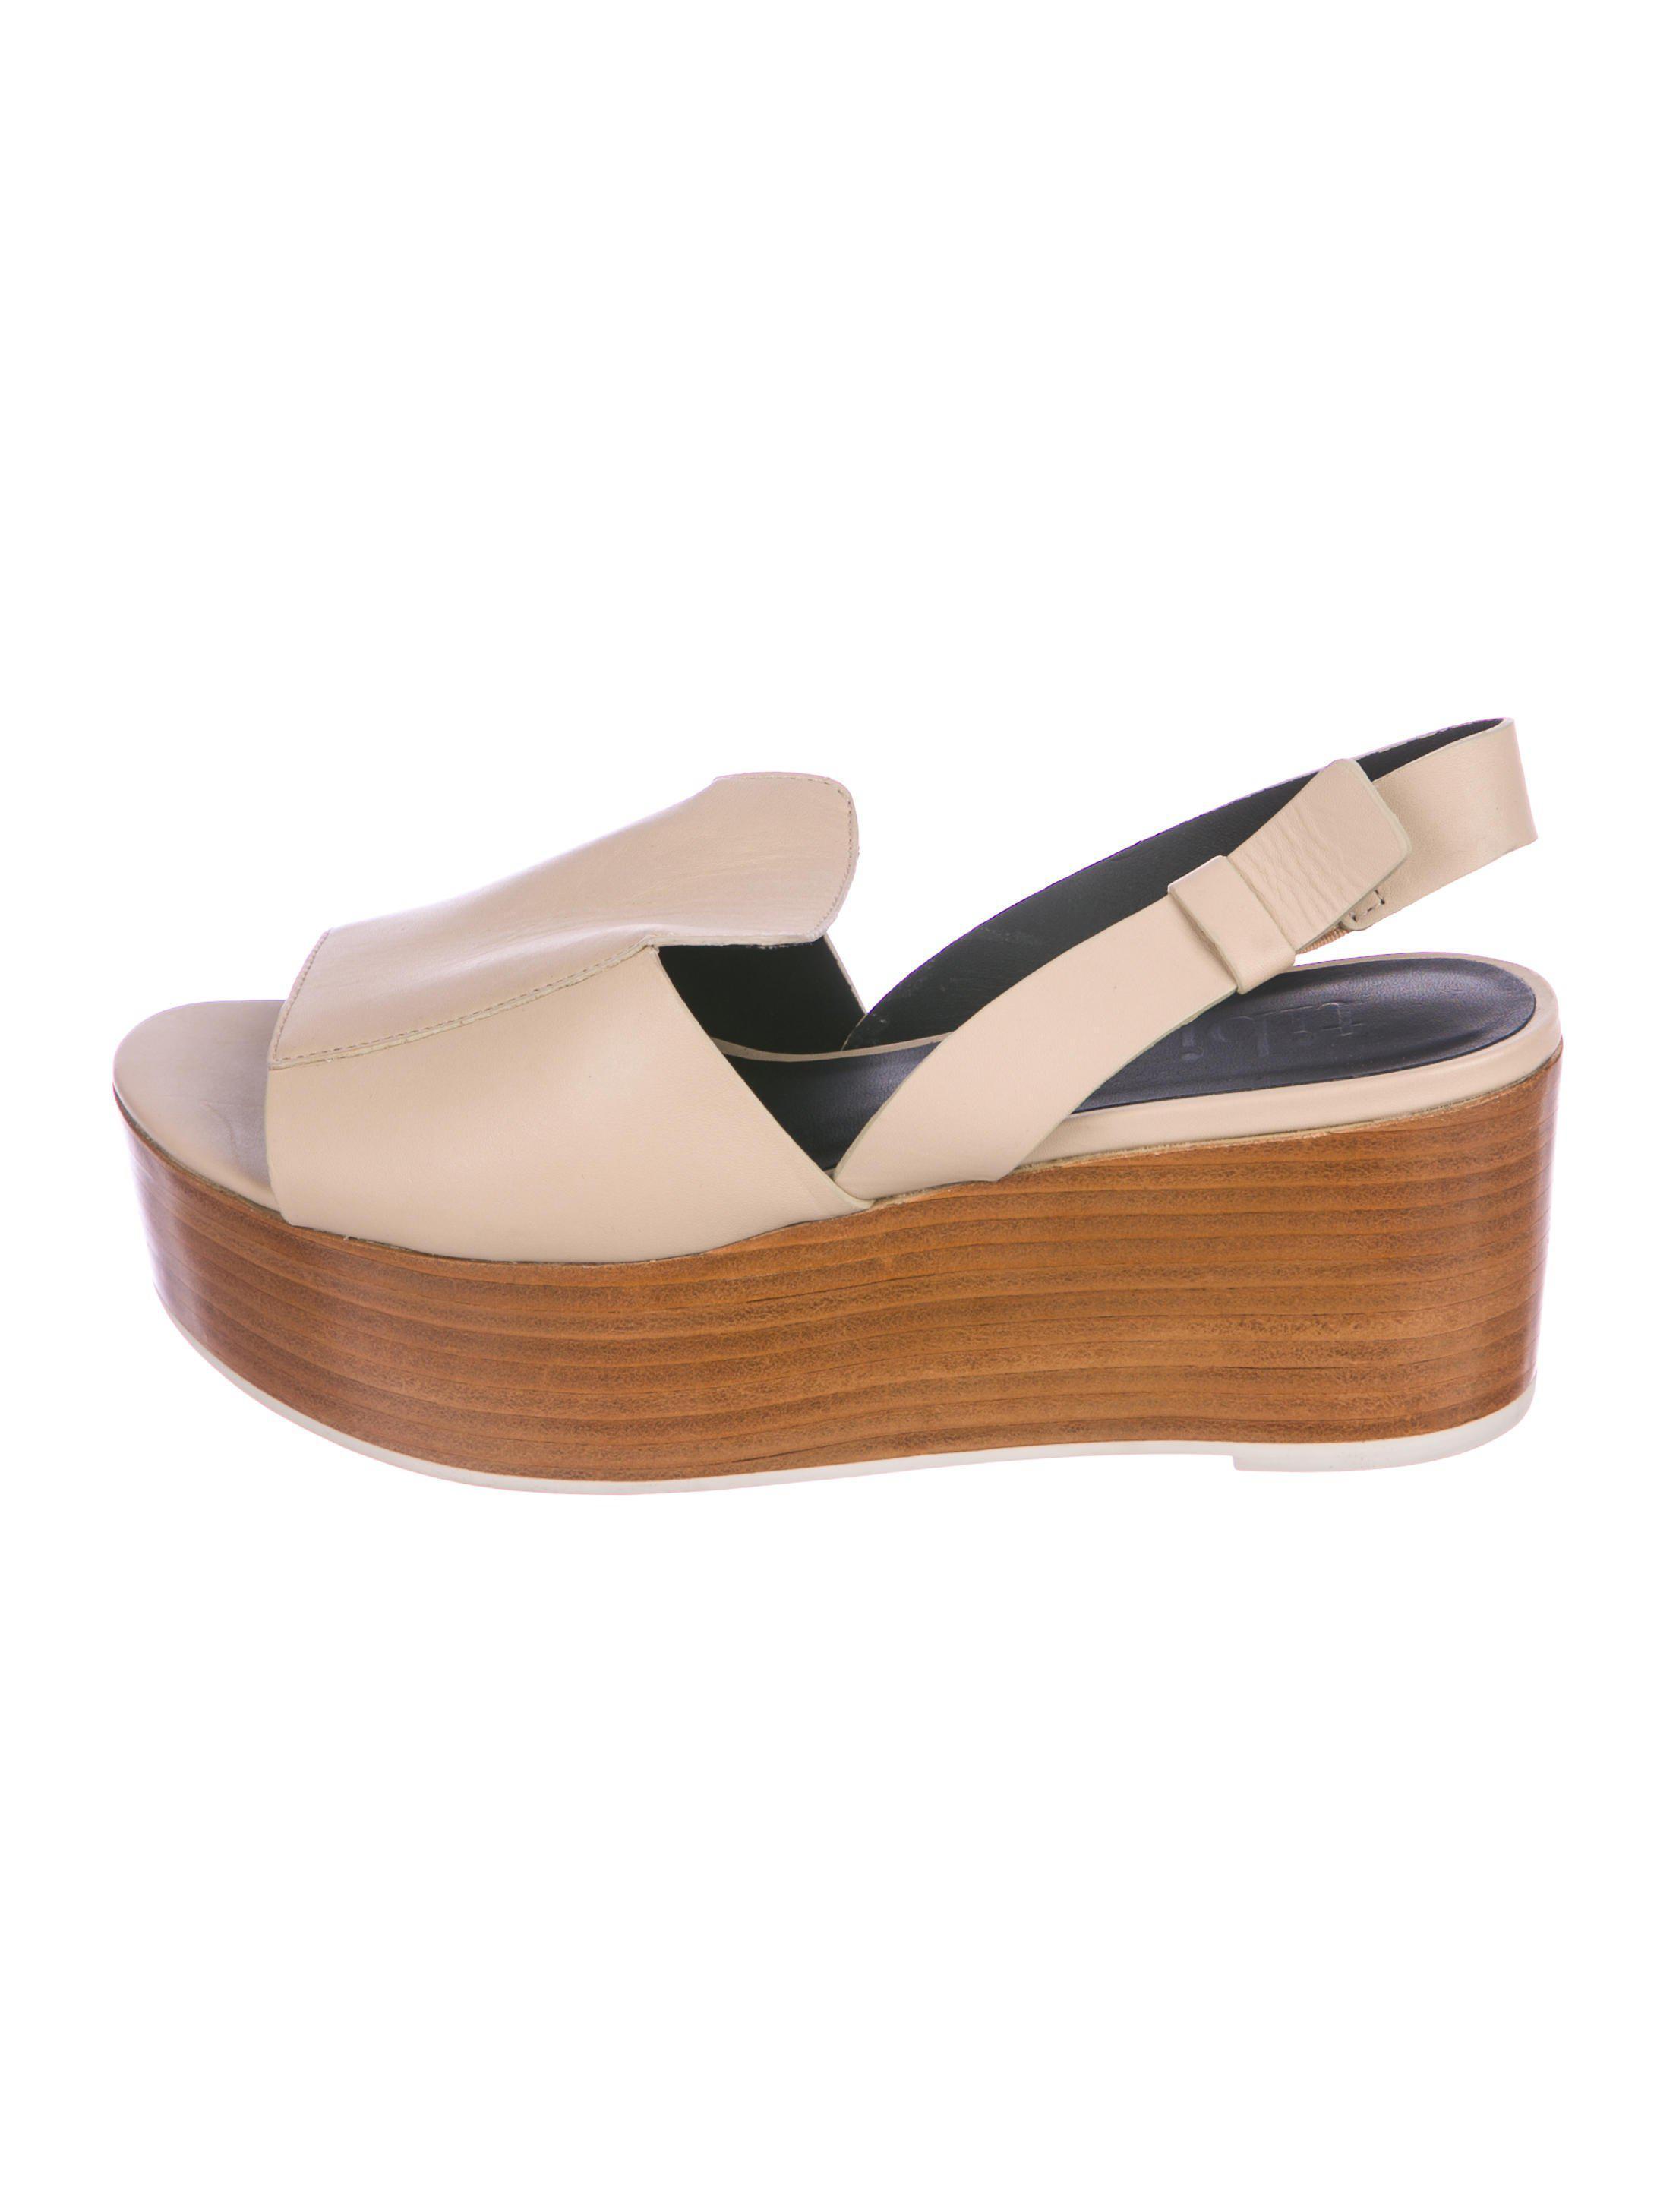 d47aea2b1b8 Lyst - Tibi Leather Platform Sandals in Brown